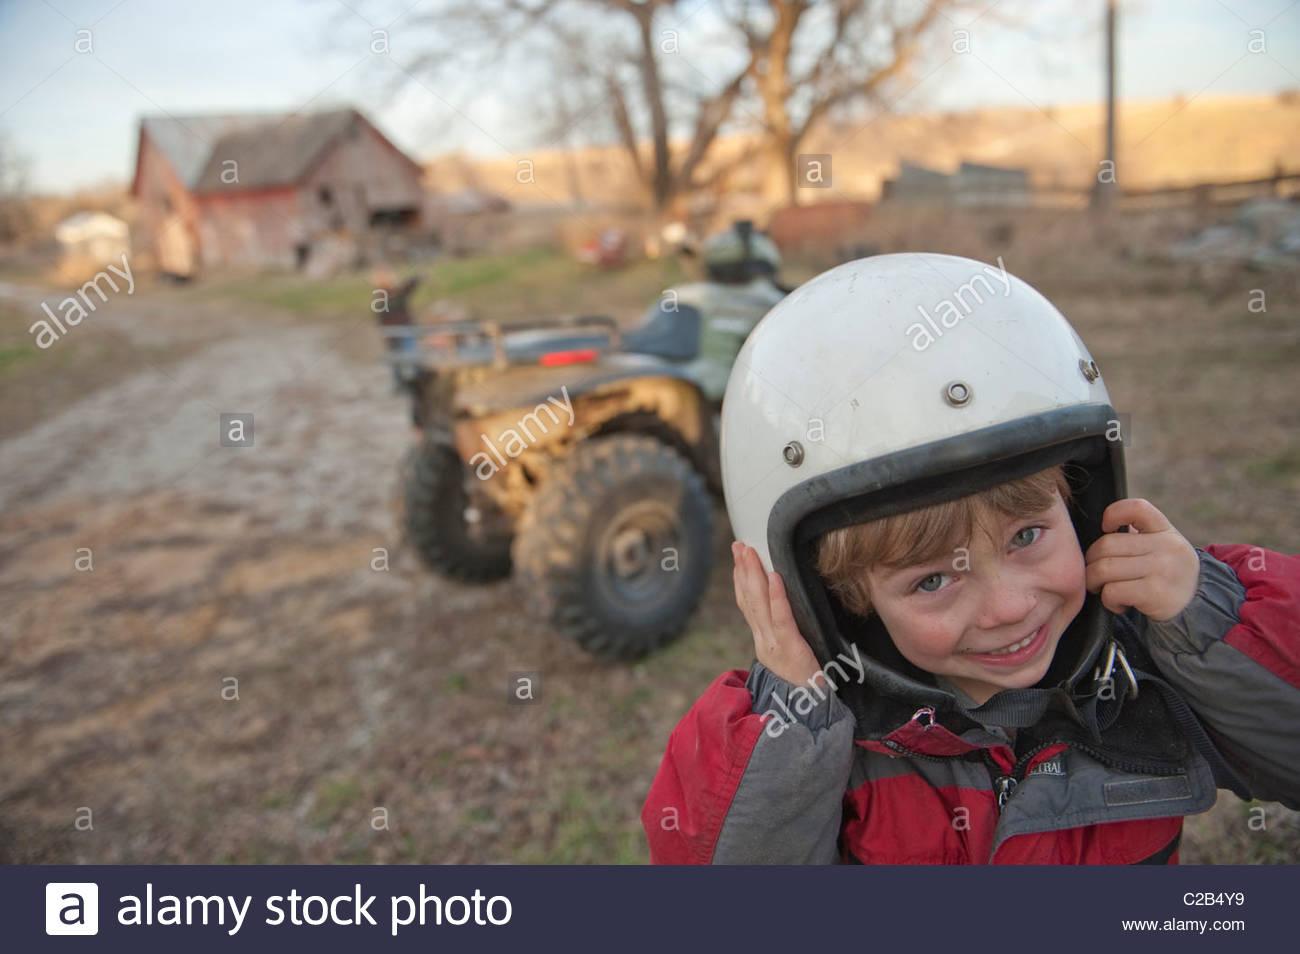 Un joven vistiendo un casco protector en una granja en Dunbar, Nebraska. Imagen De Stock